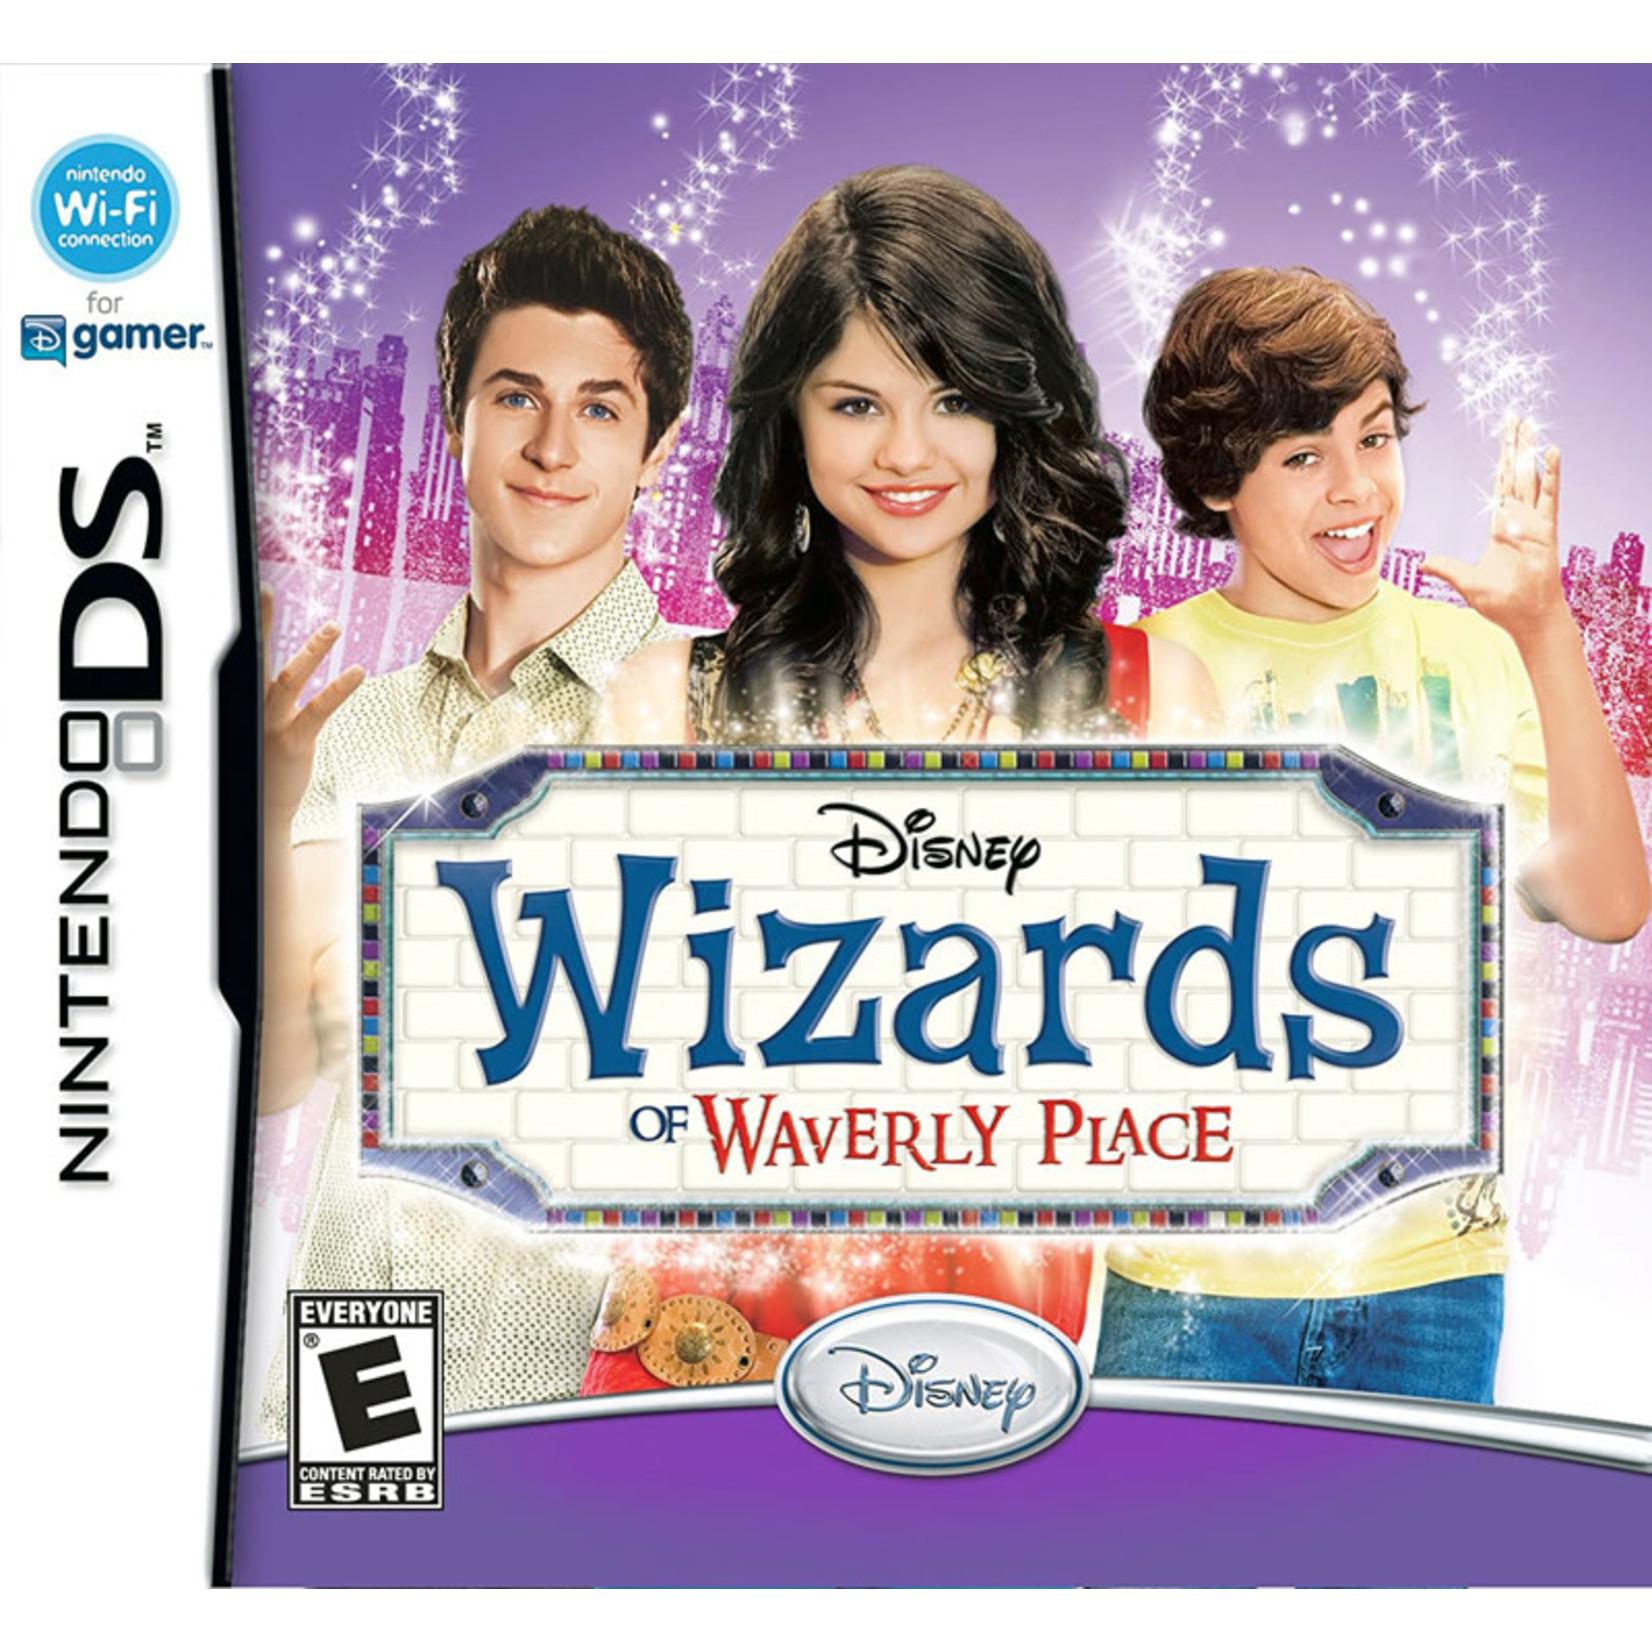 DSU-Wizards of Waverly Place